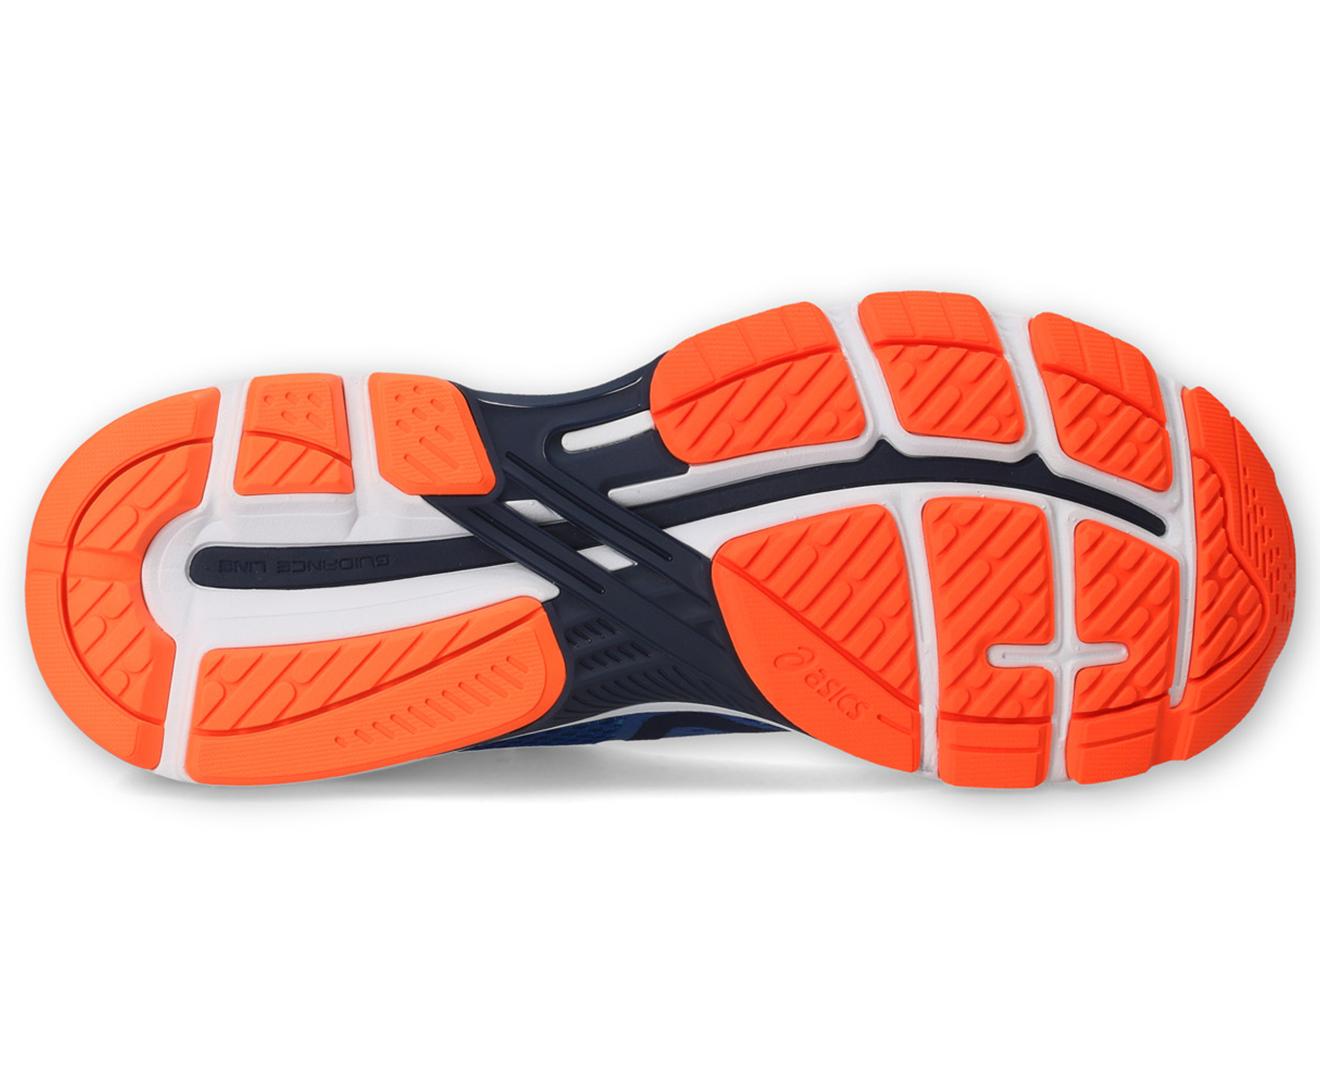 ace5be0ad ASICS Men's GT-2000 6 Shoe - Imperial/Indigo Blue/Shocking Orange    Catch.com.au